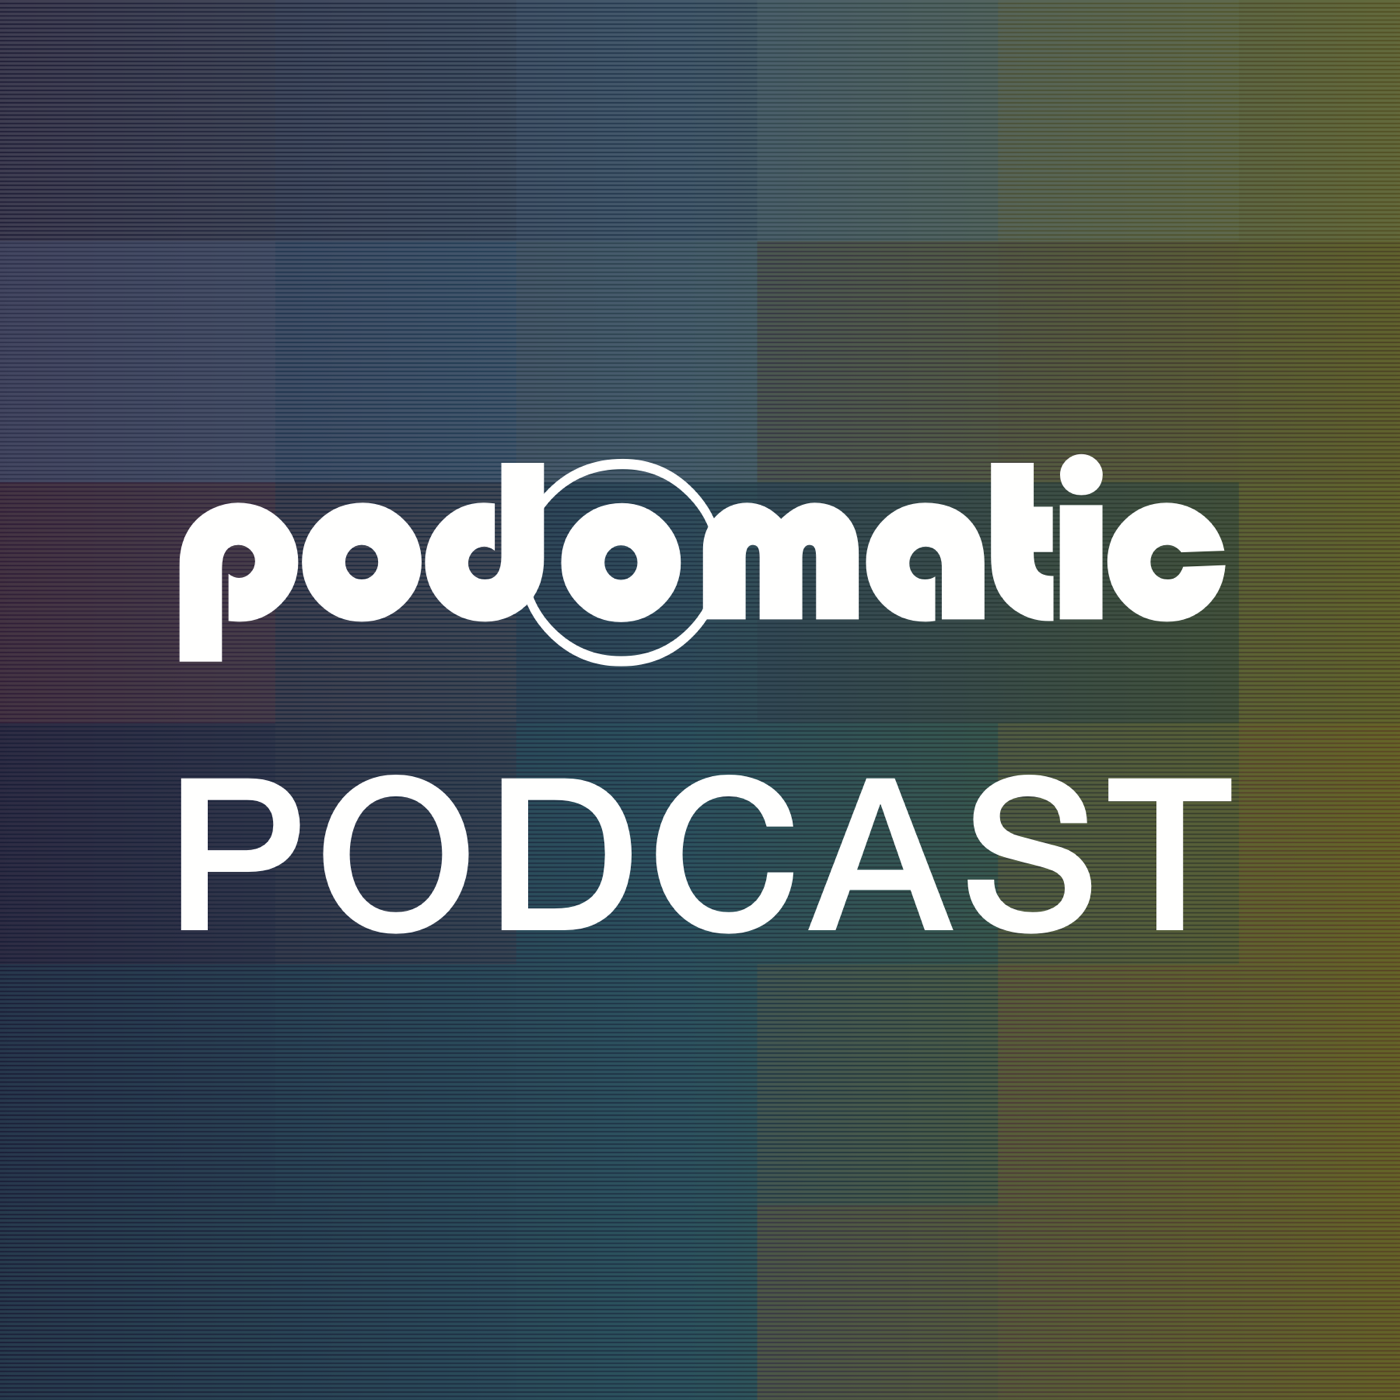 asad's Podcast